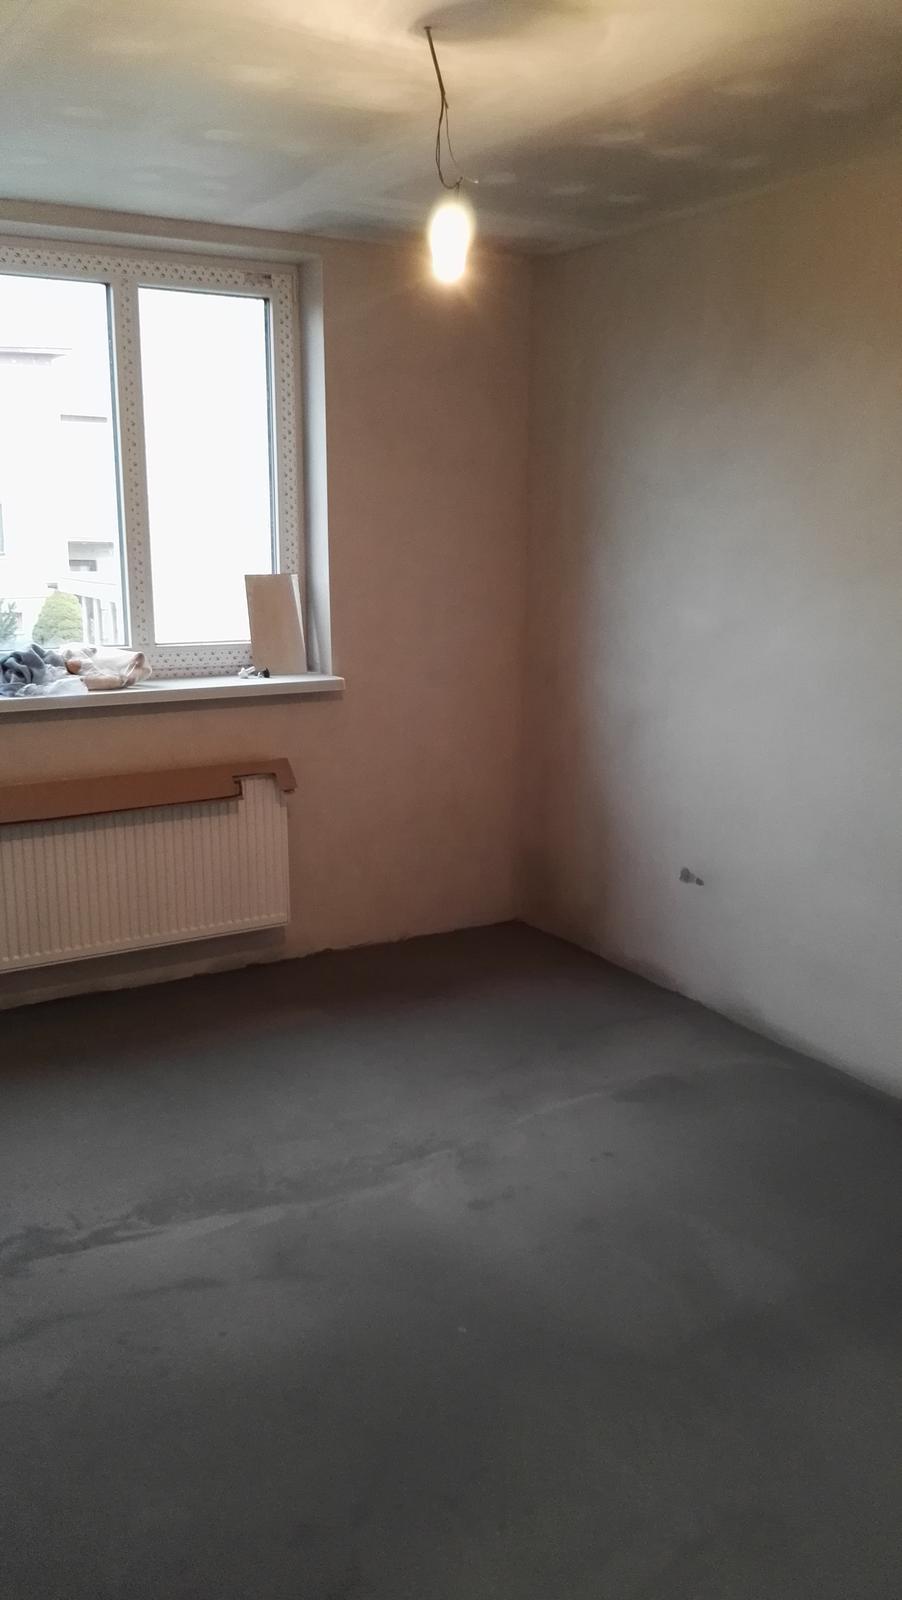 Projekt: Nové bývanie ... - ... stierky a nivelačka hotové ...